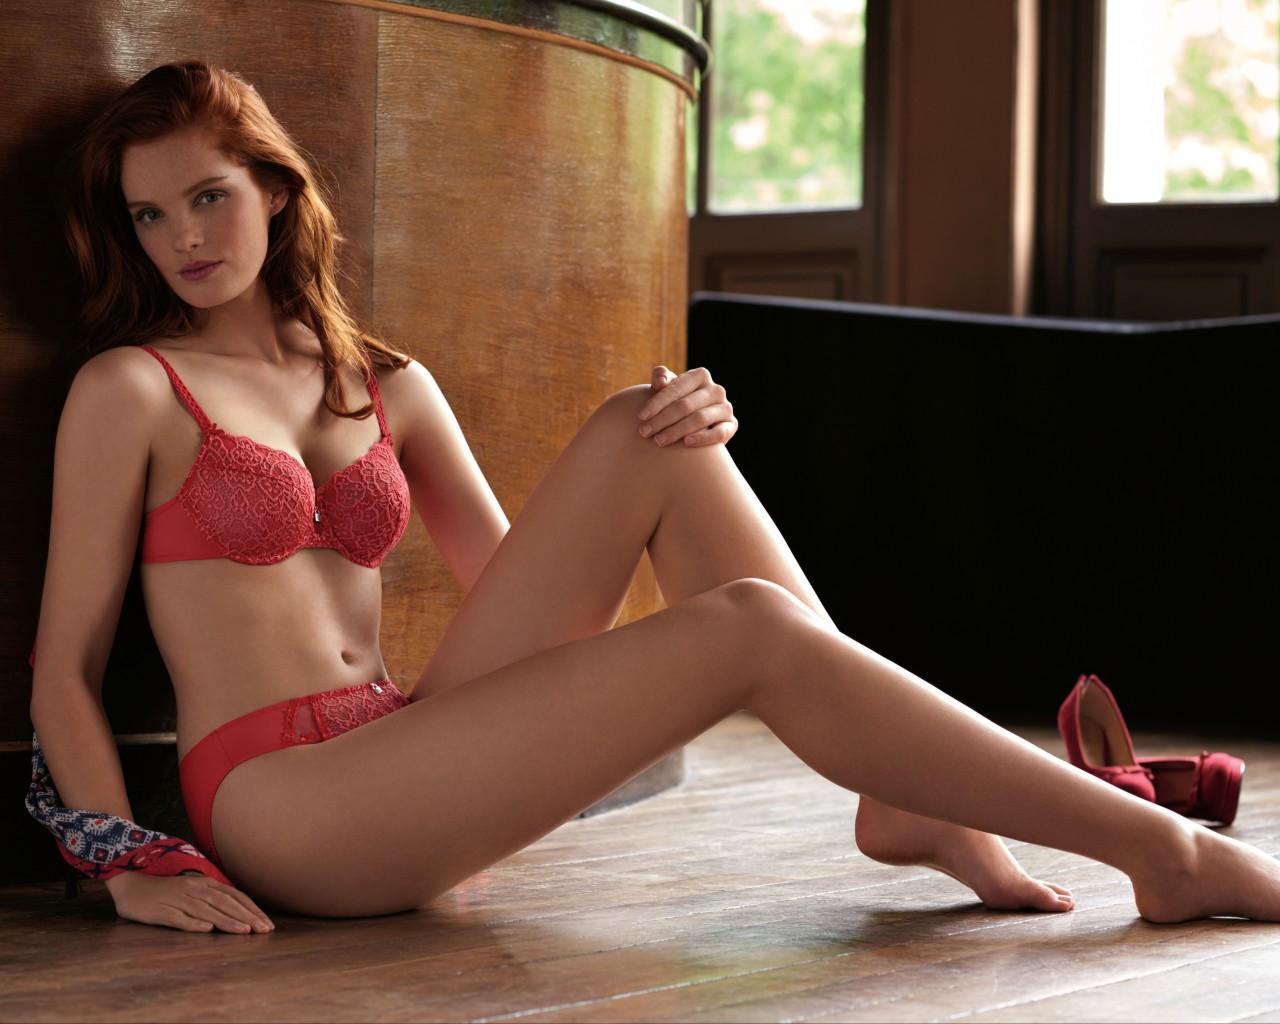 Sexiest hd nude ebony girls remarkable, very